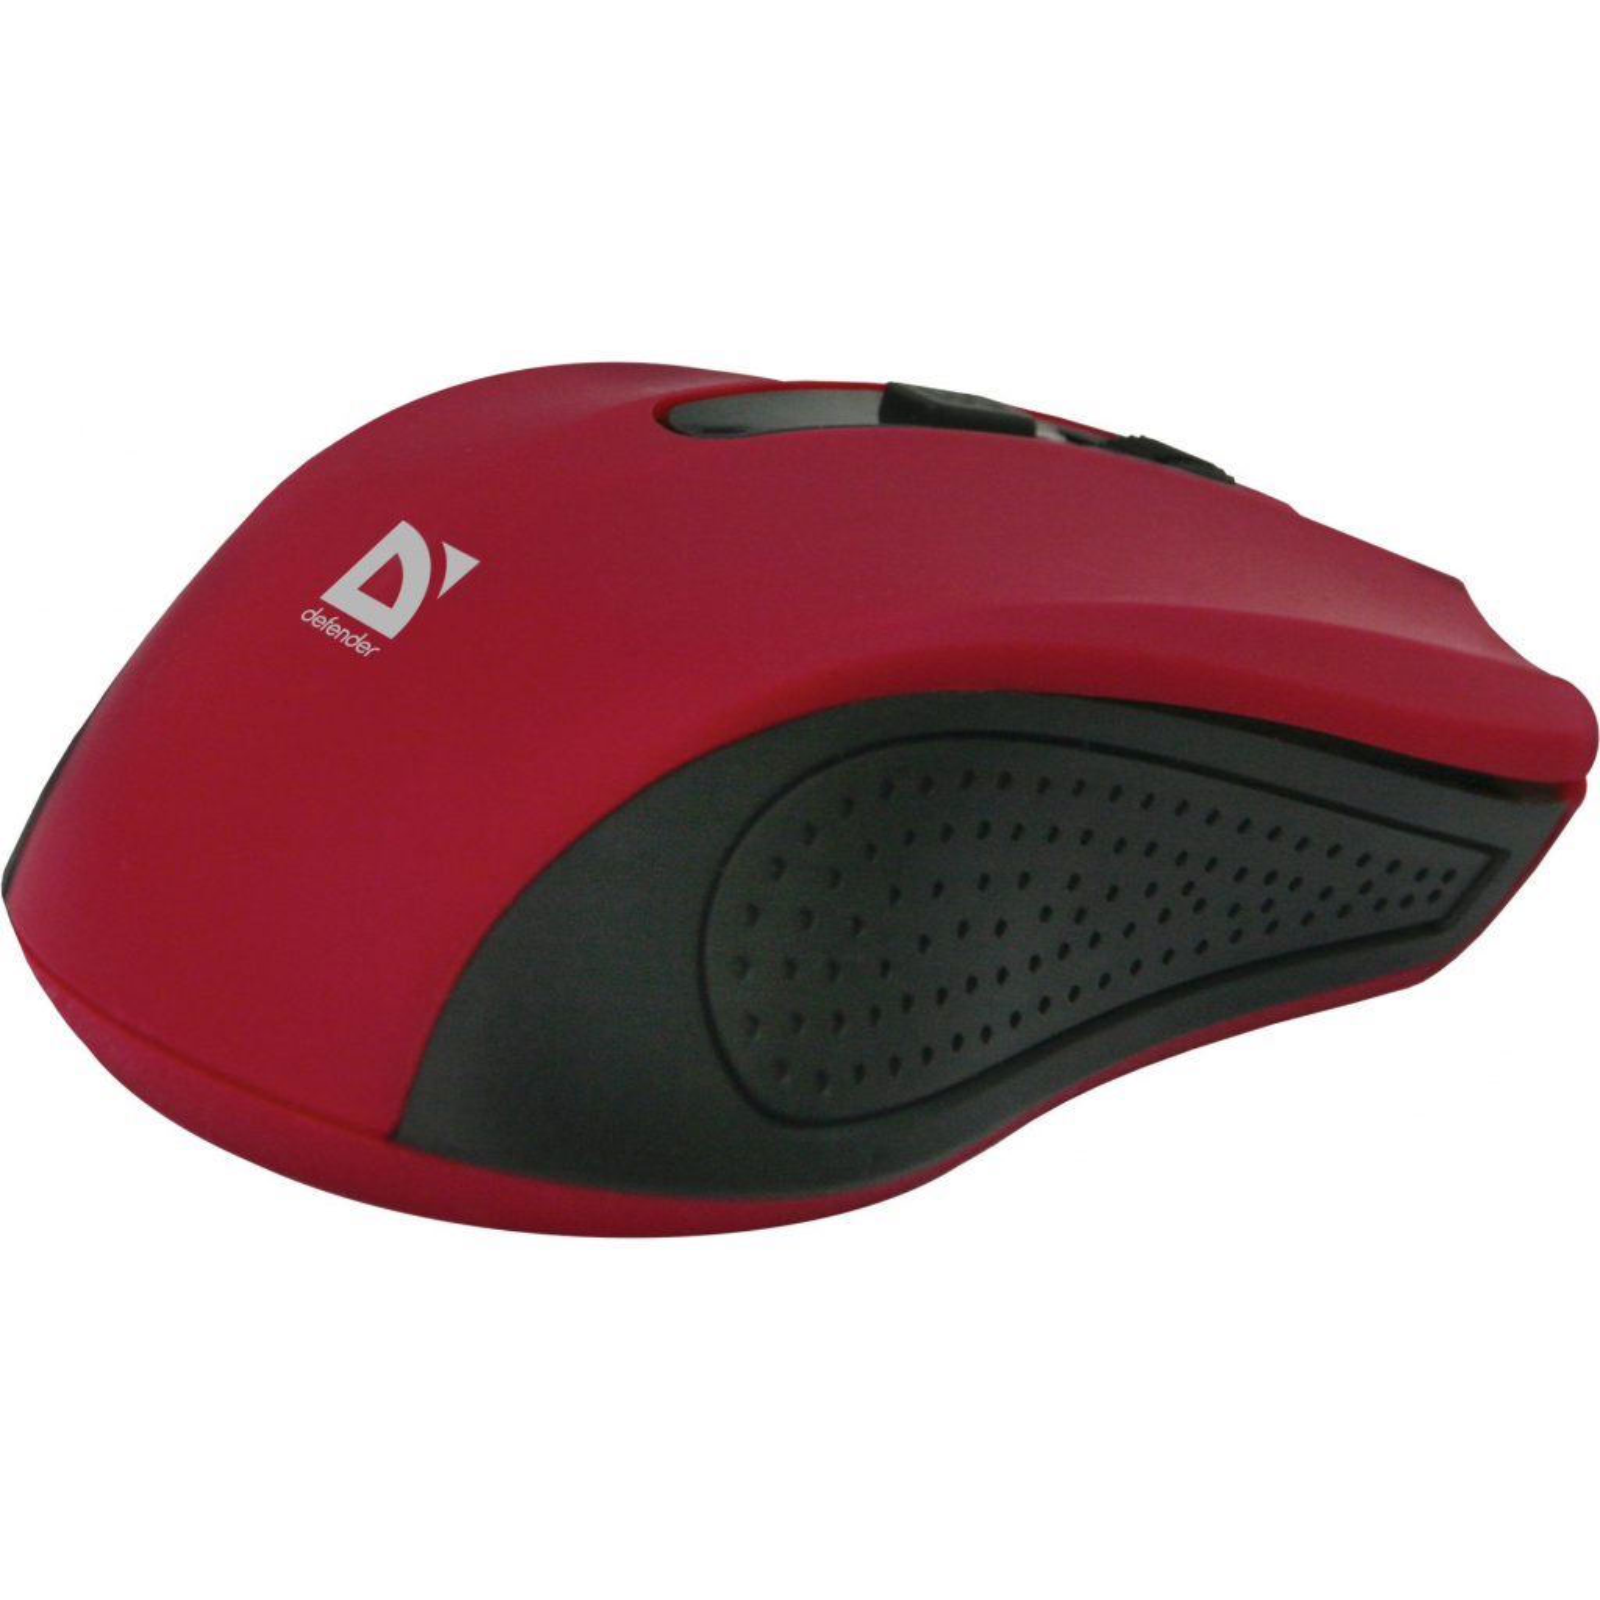 Мышка Defender Accura MM-935 Black (52935) изображение 2